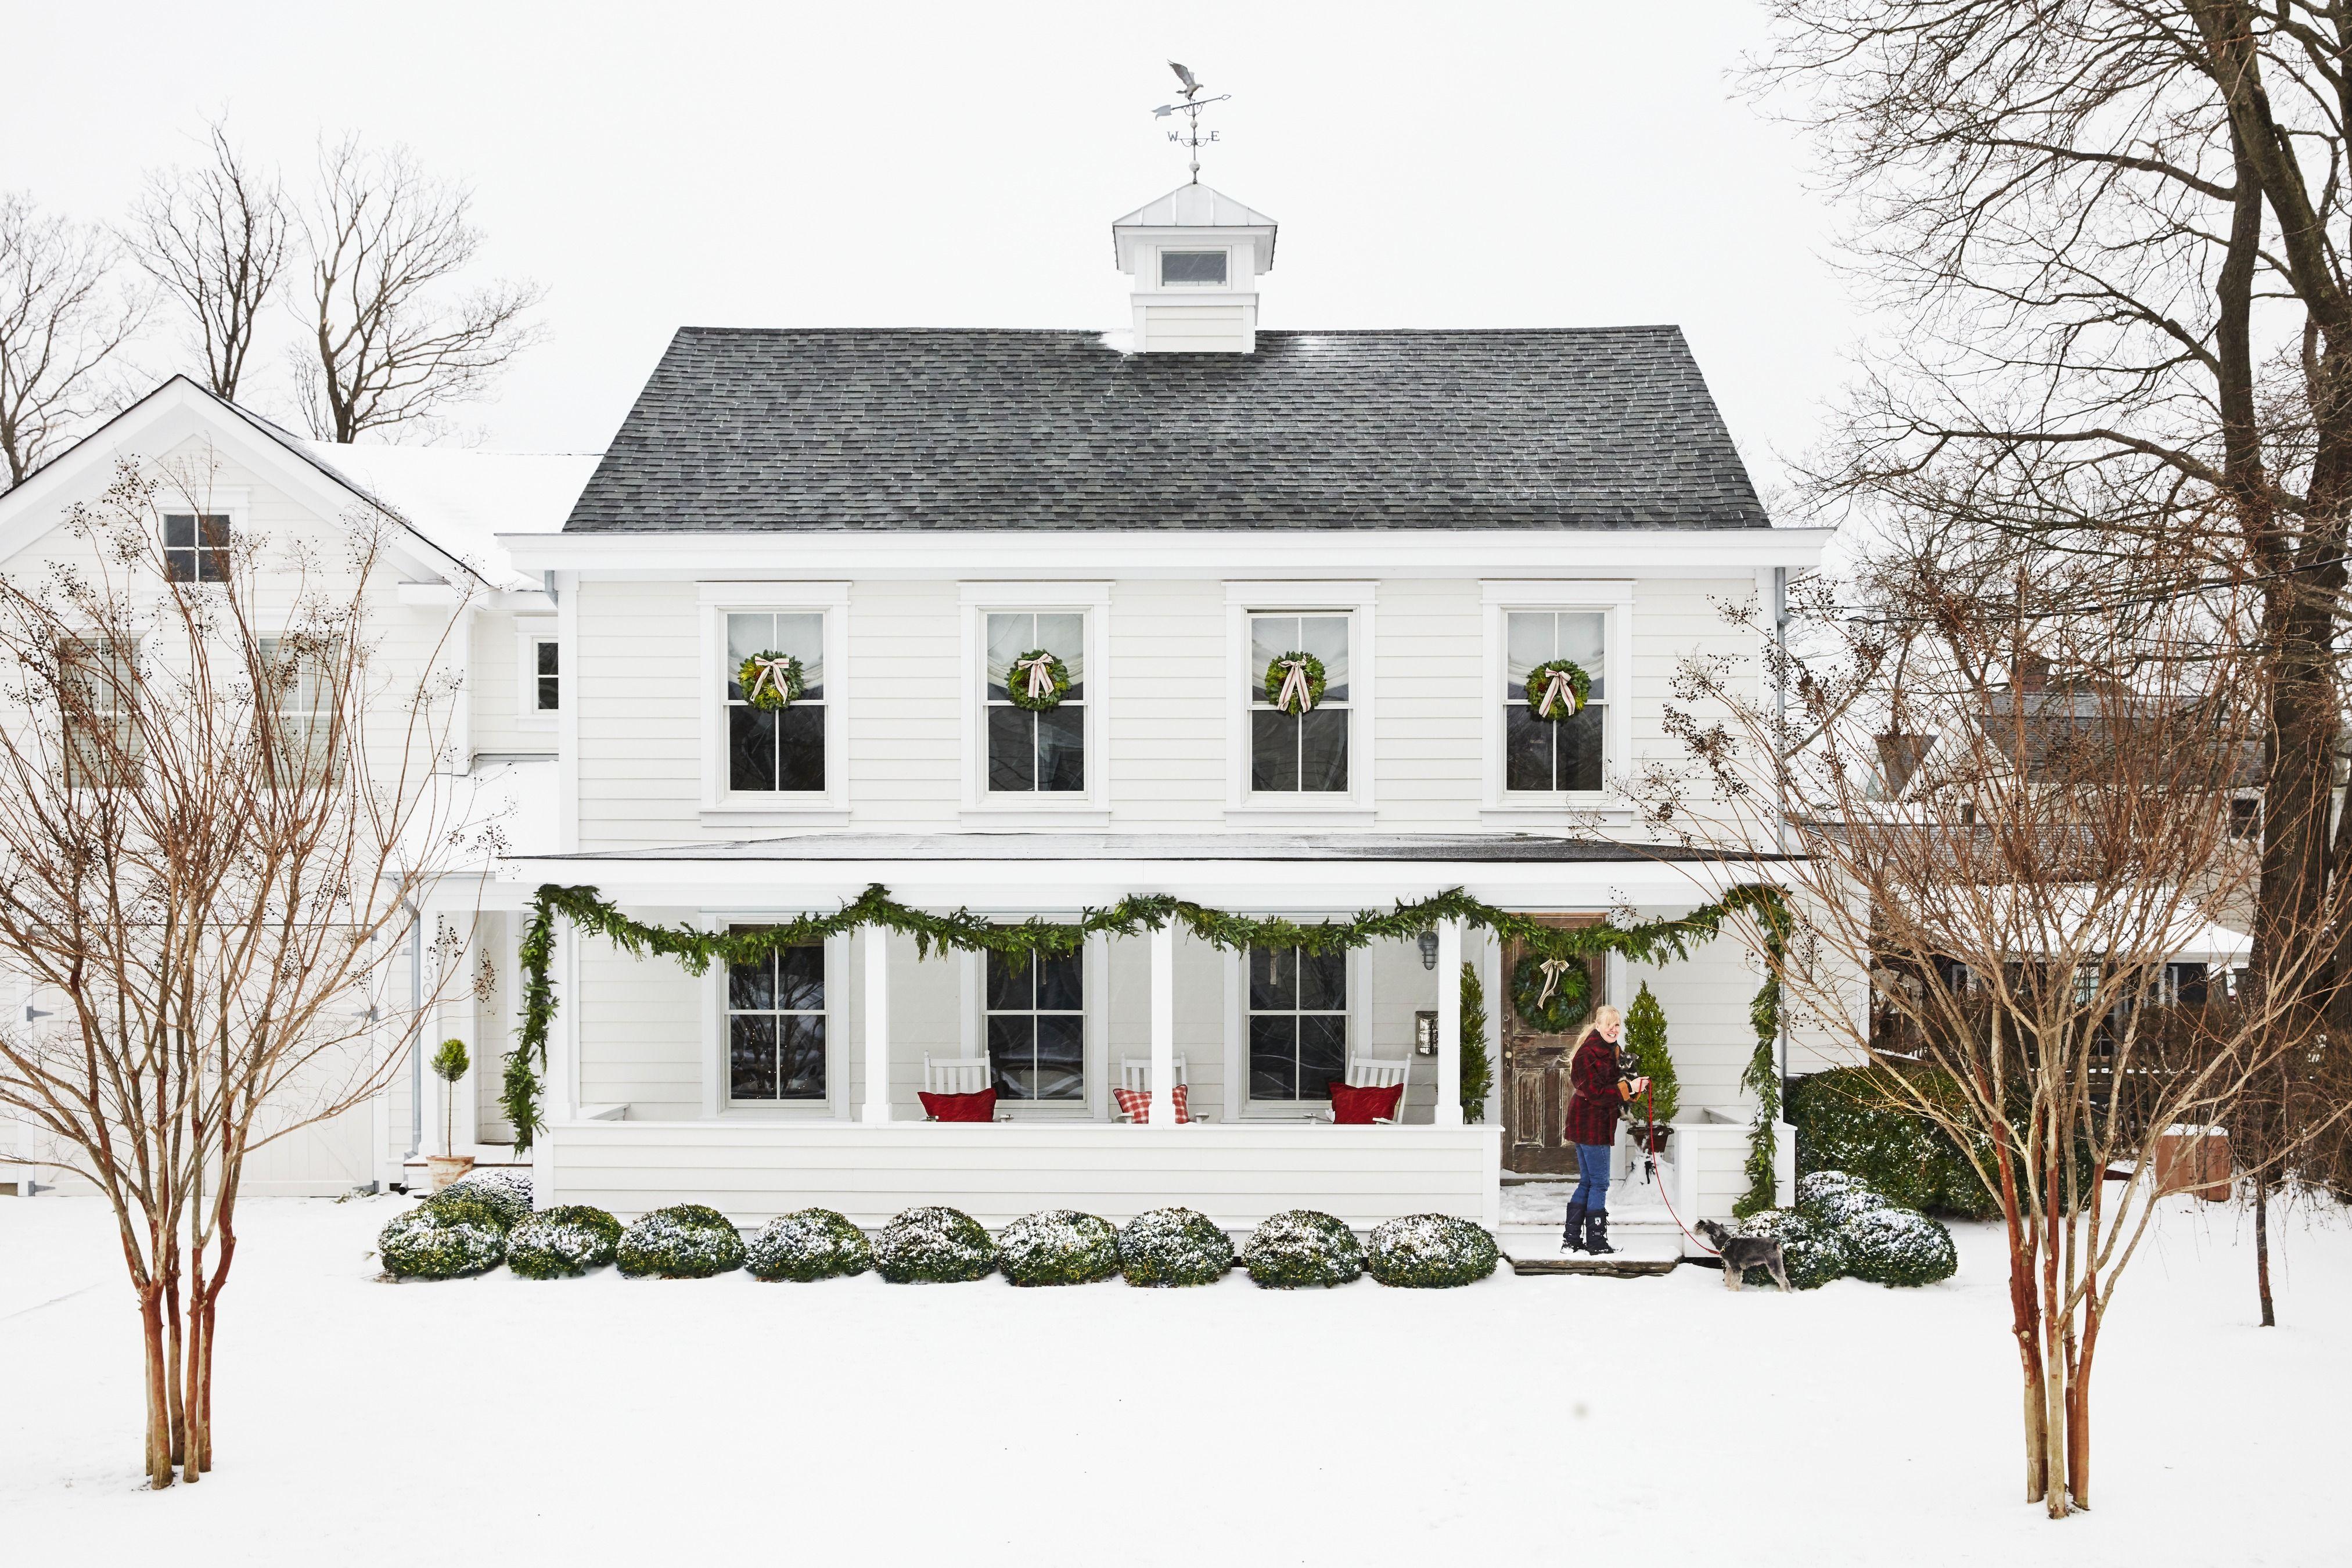 80 Diy Christmas Wreaths How To Make Holiday Wreaths